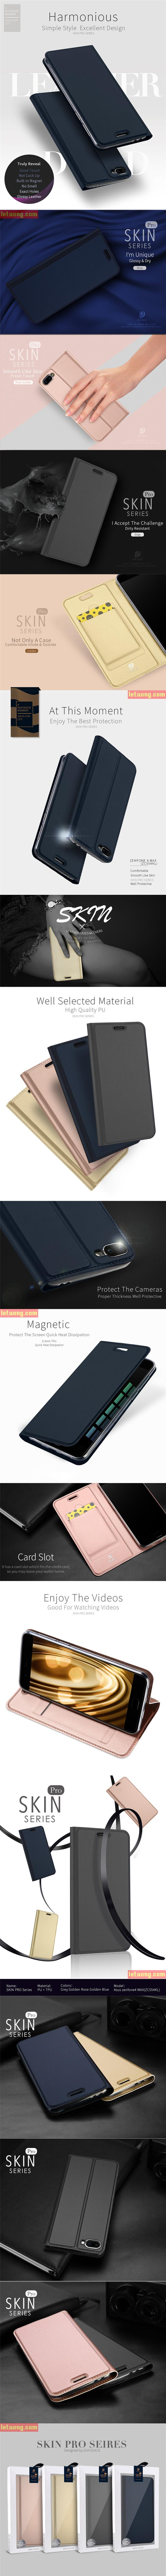 Bao da Zenfone 4 Max Pro ZC554KL Dux Ducis Skin siêu mỏng khung mềm 4